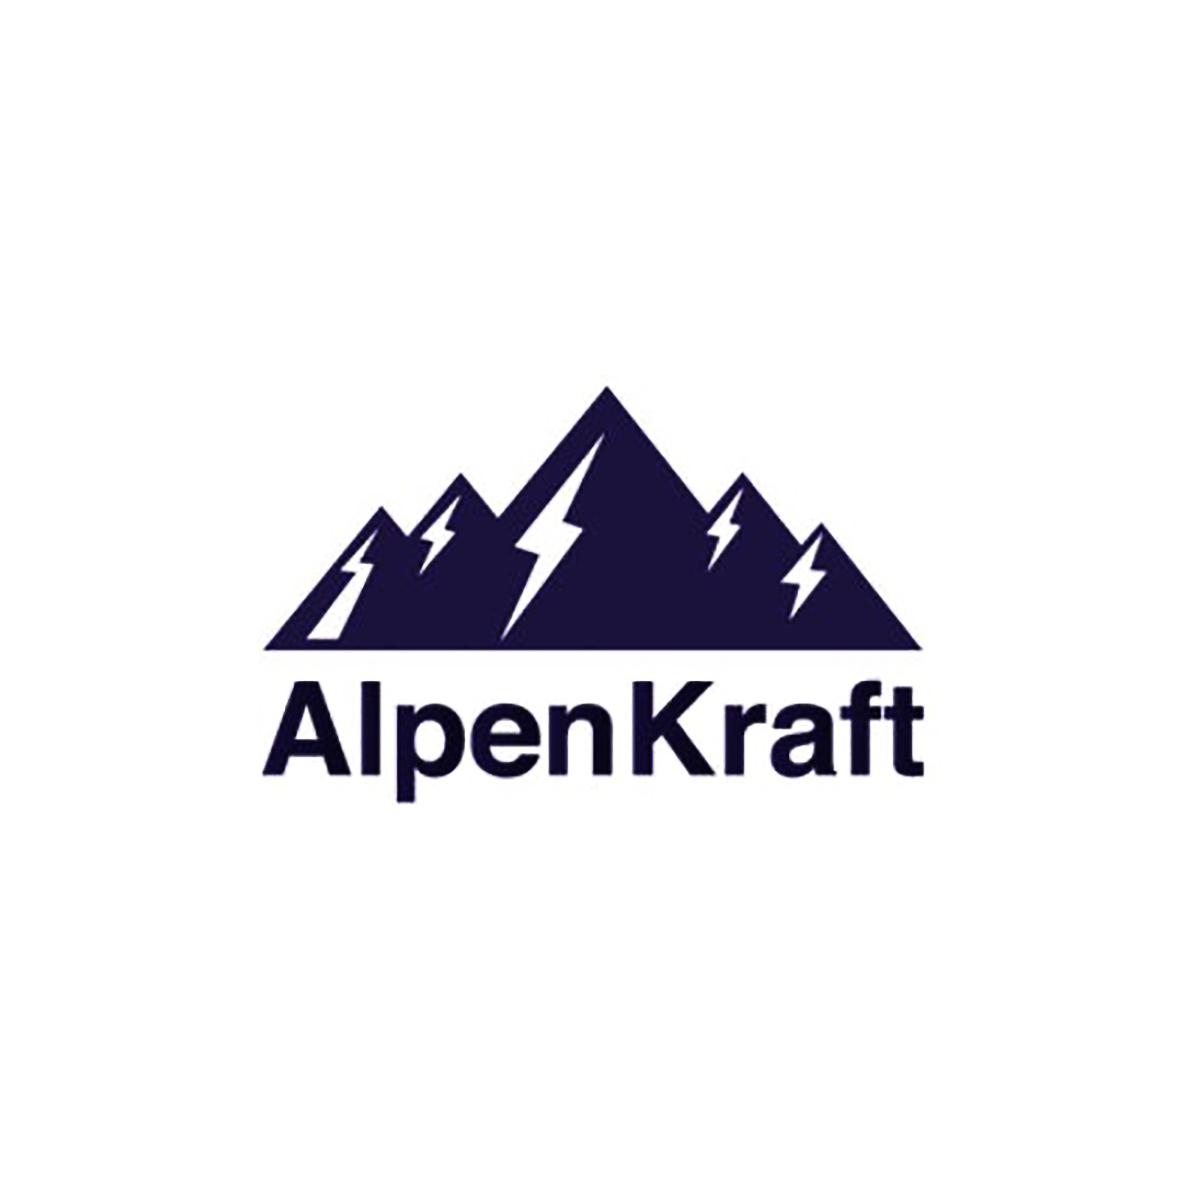 Alpencraft